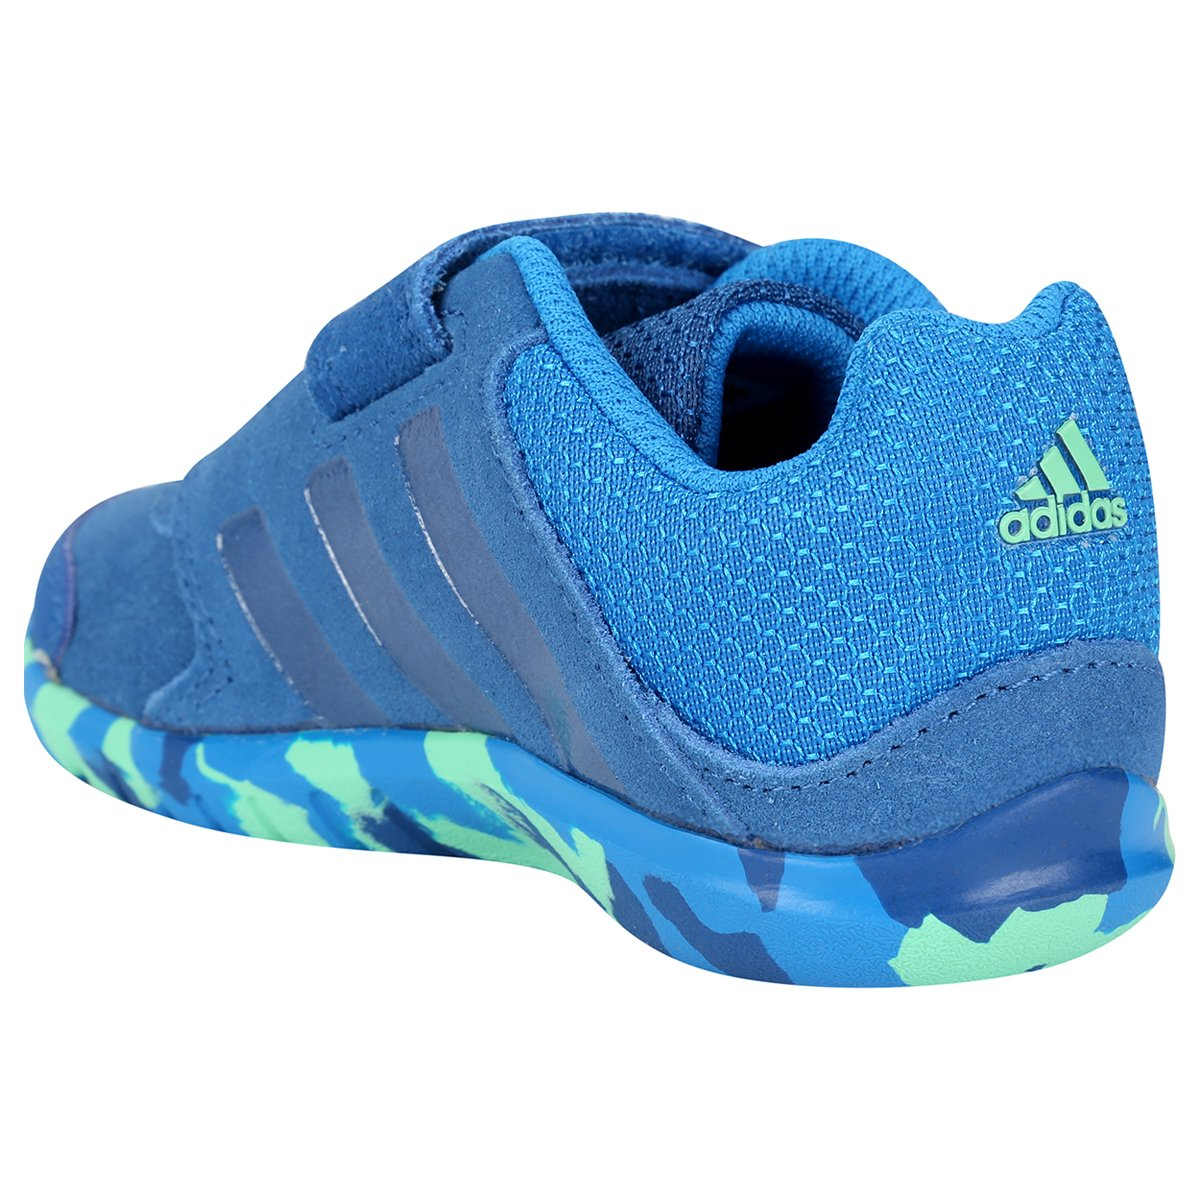 Tênis Adidas Katnat 3 Ac I Infantil - Compre Agora  311b72b7d09f8